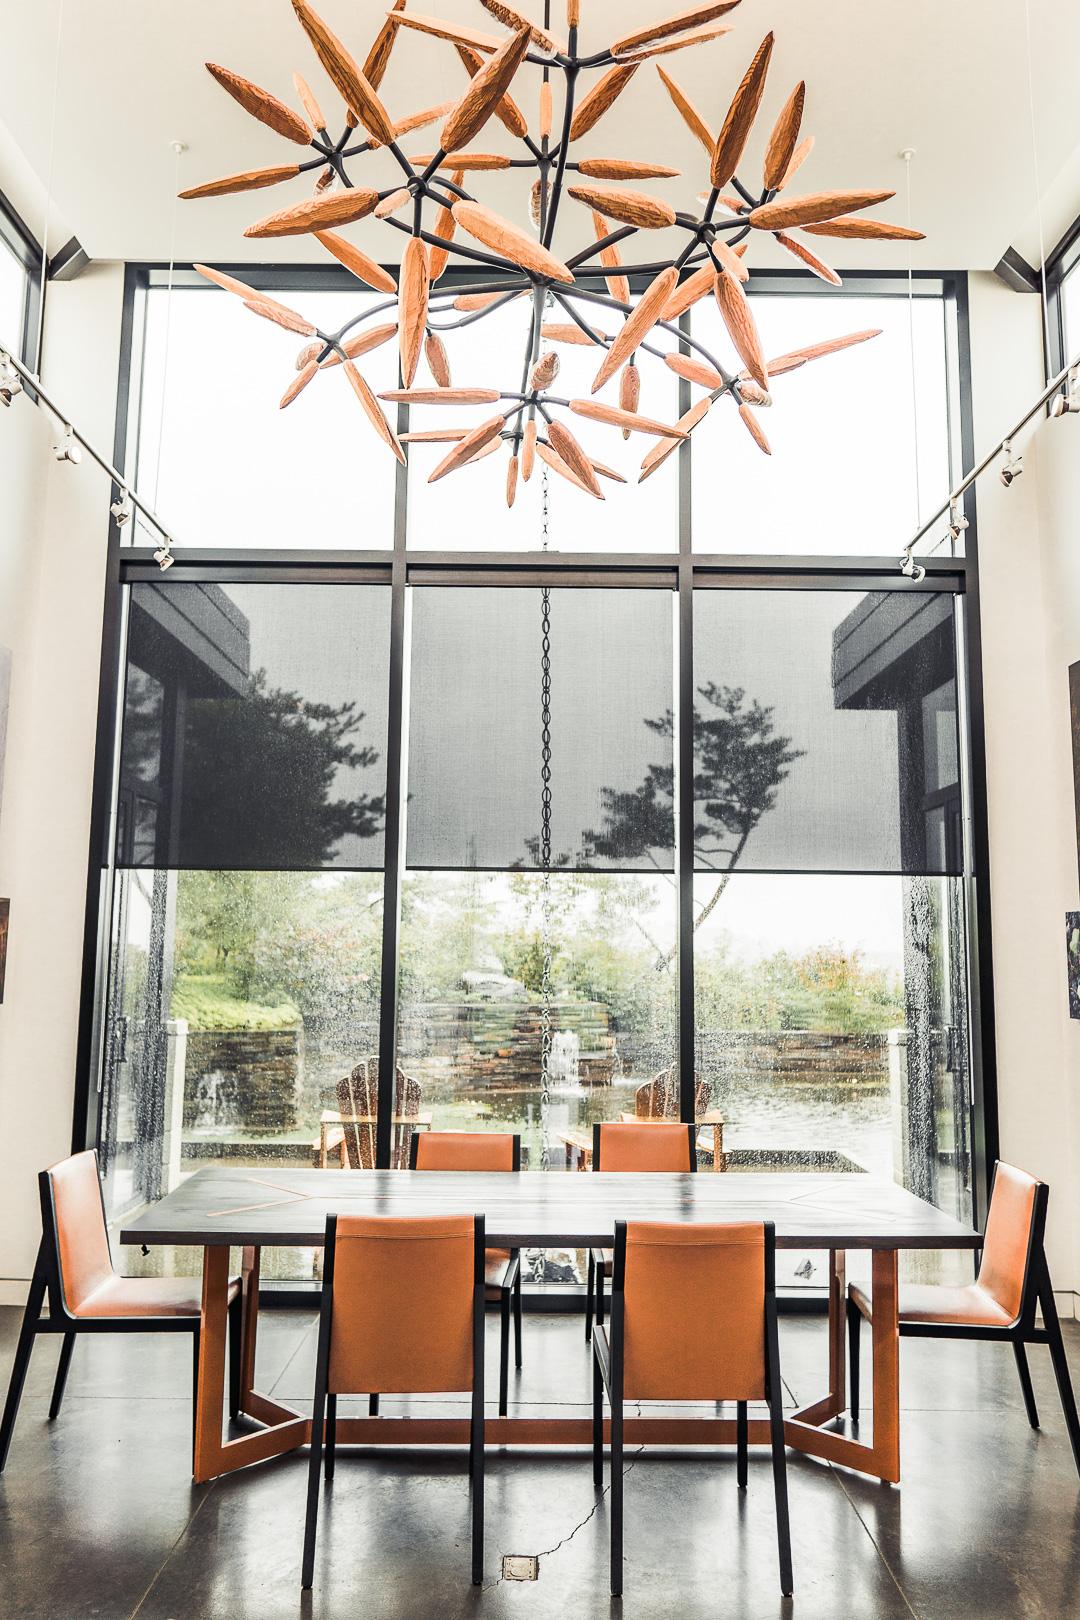 Private Tasting Room at Saffron Fields Vineyard